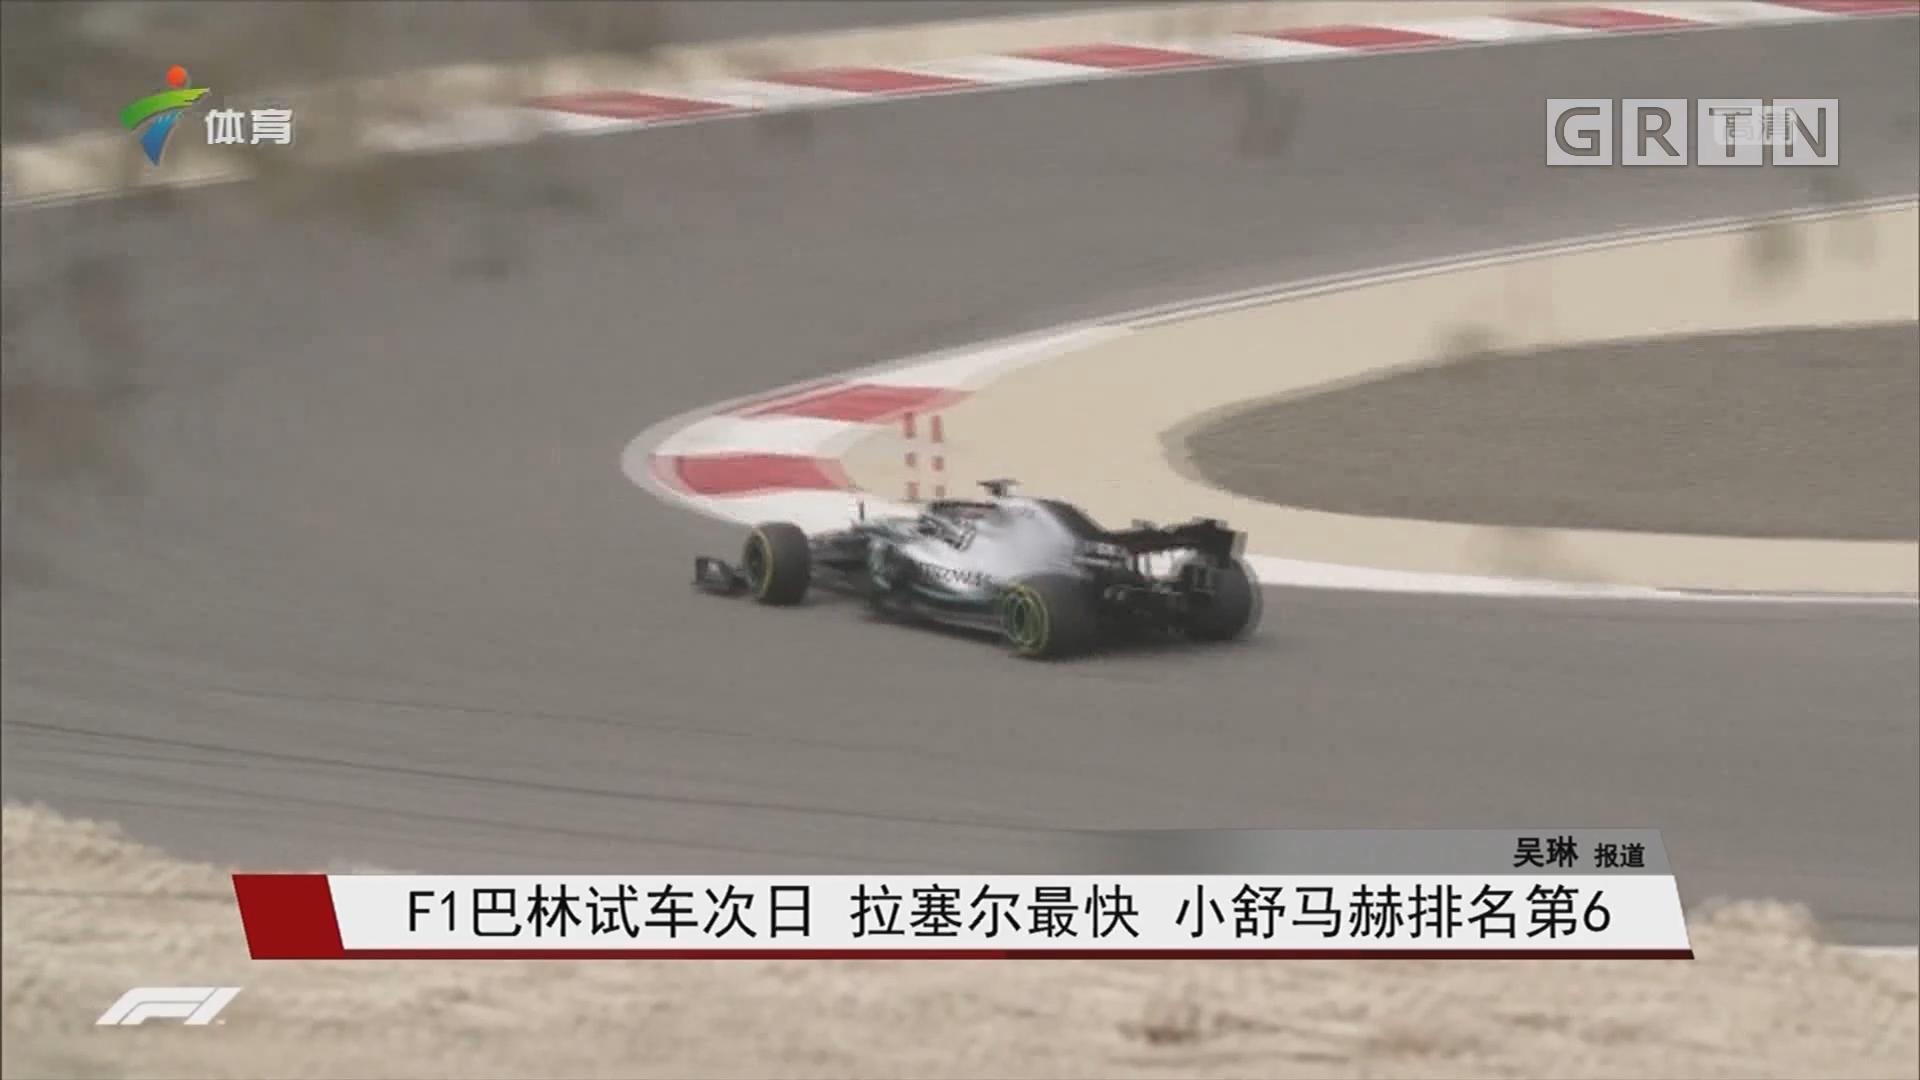 F1巴林试车次日 拉塞尔最快 小舒马赫排名第6